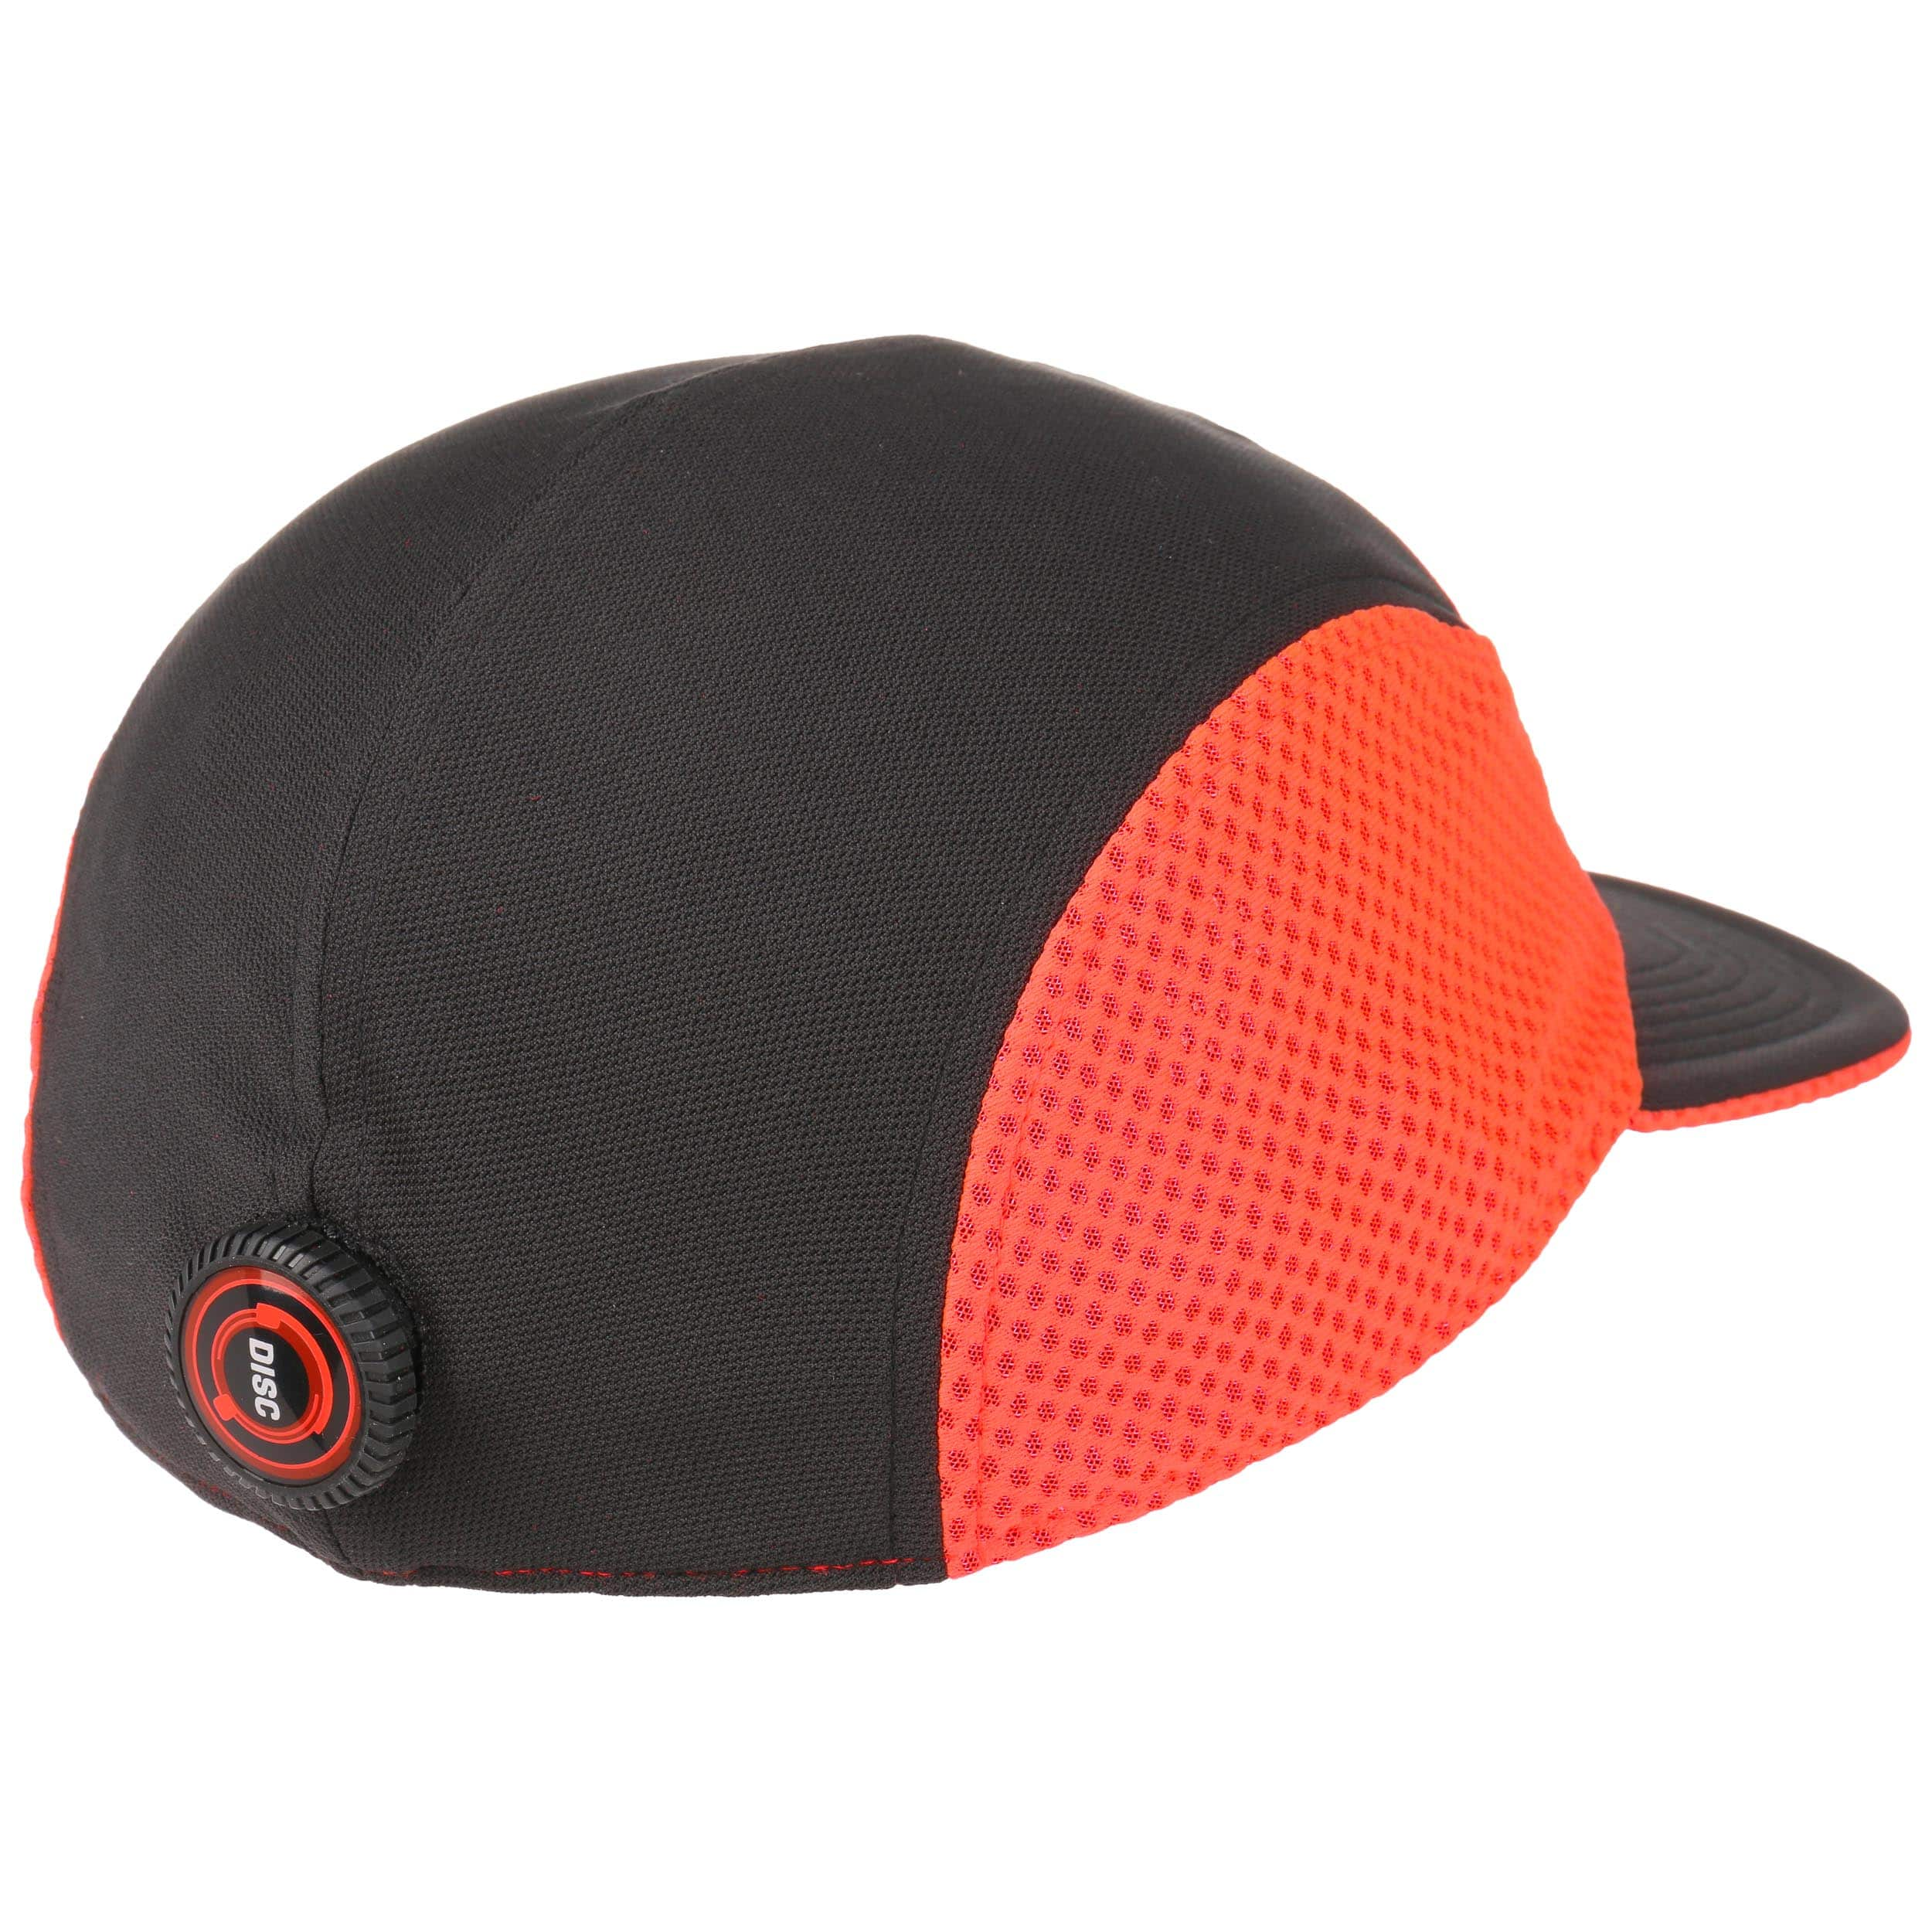 98a9eb8cdb5 ... Disc-Fit Runner Cap by PUMA - black-red 3 ...